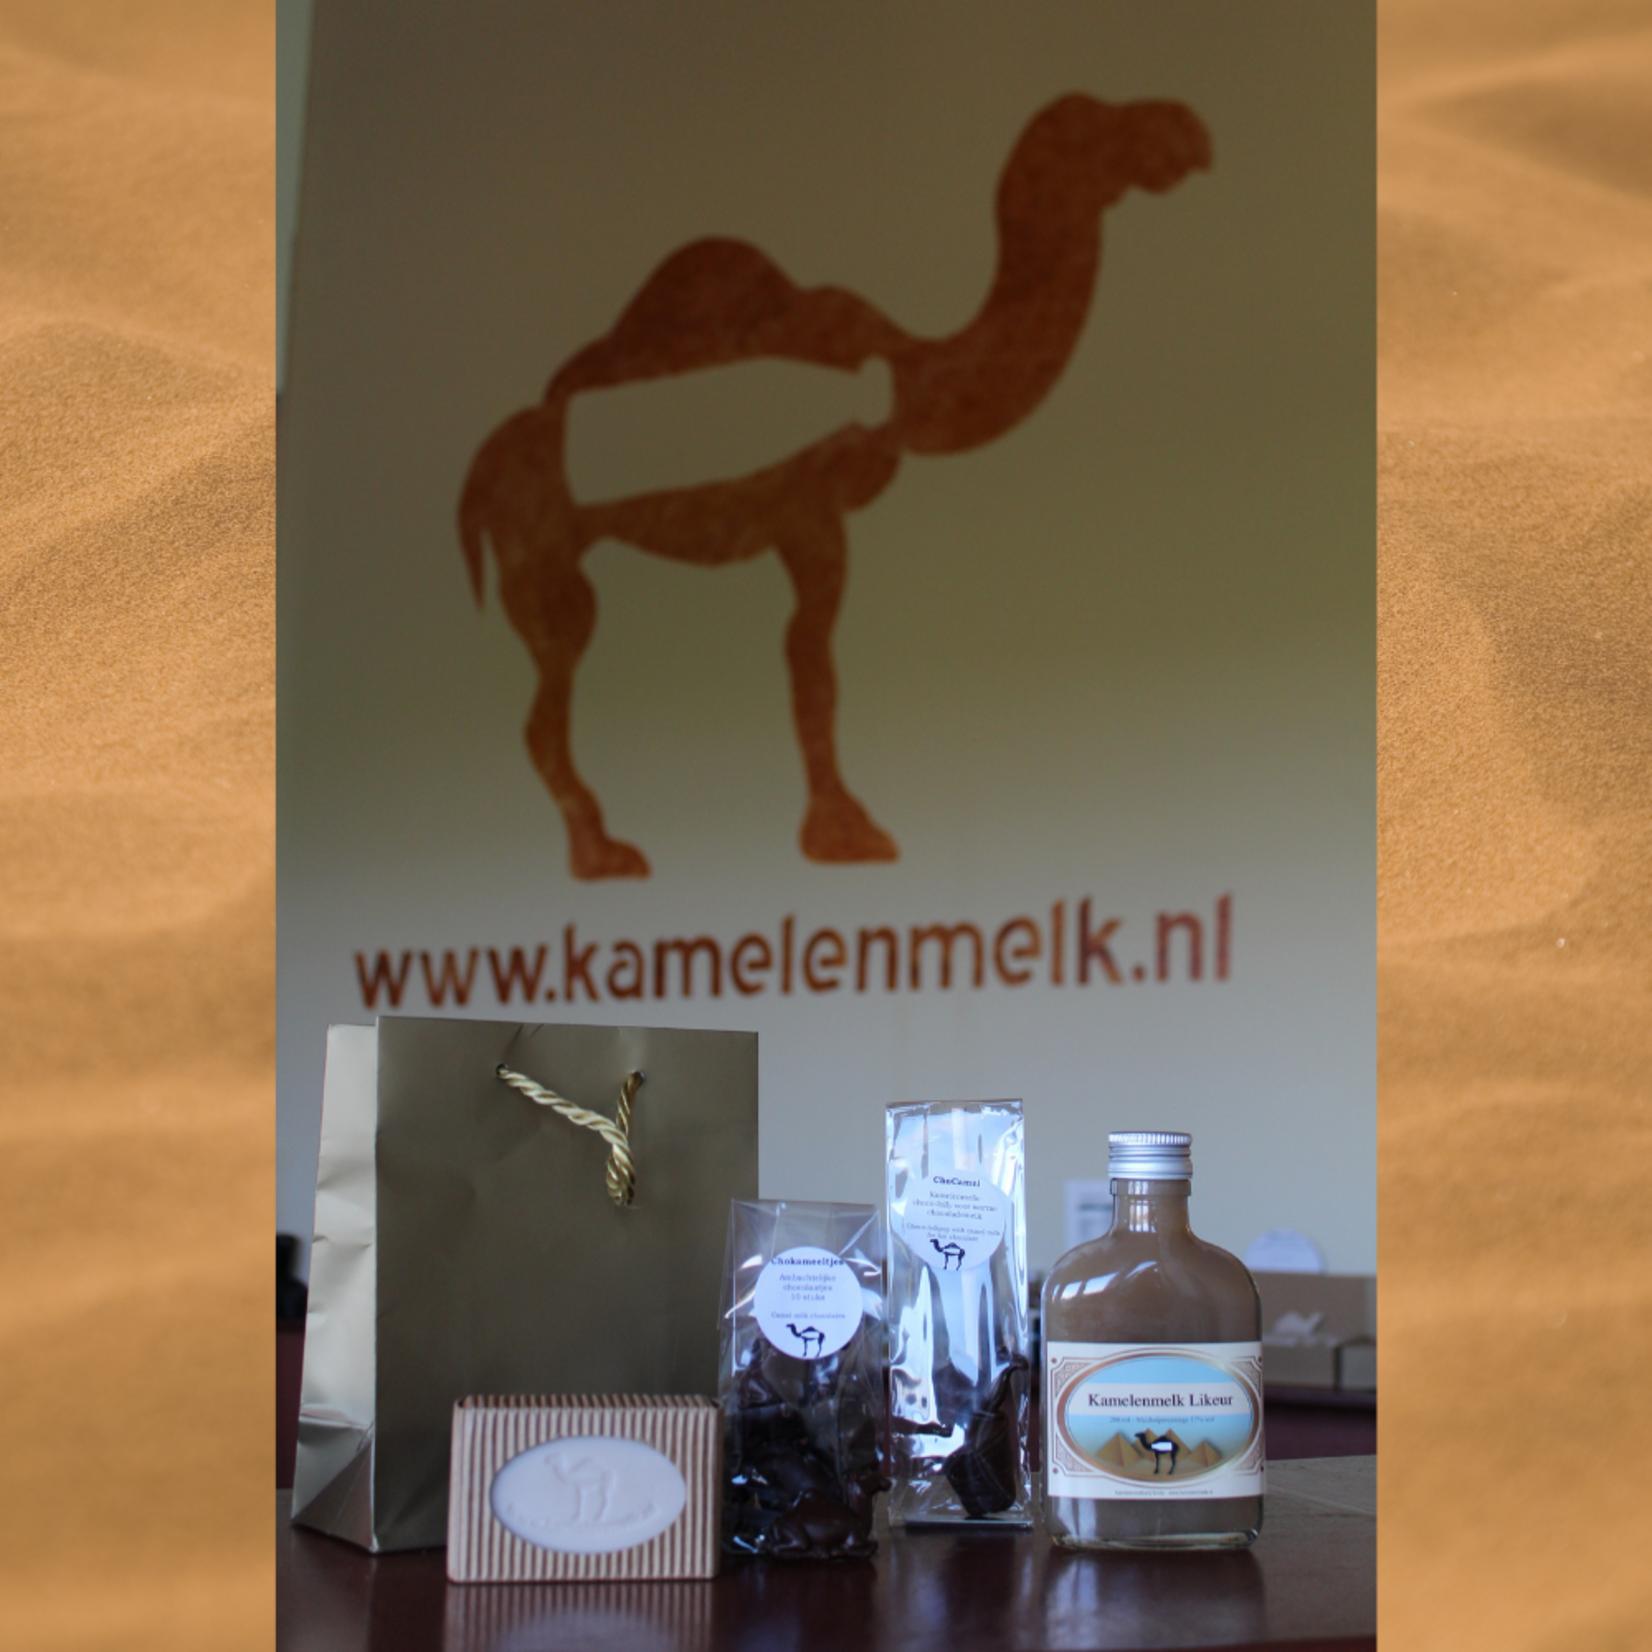 Kamelen cadeau pakket 2 met kamelenzeep, chokameeltjes, een Choco-lolly en een flesje kamelenmelk likeur